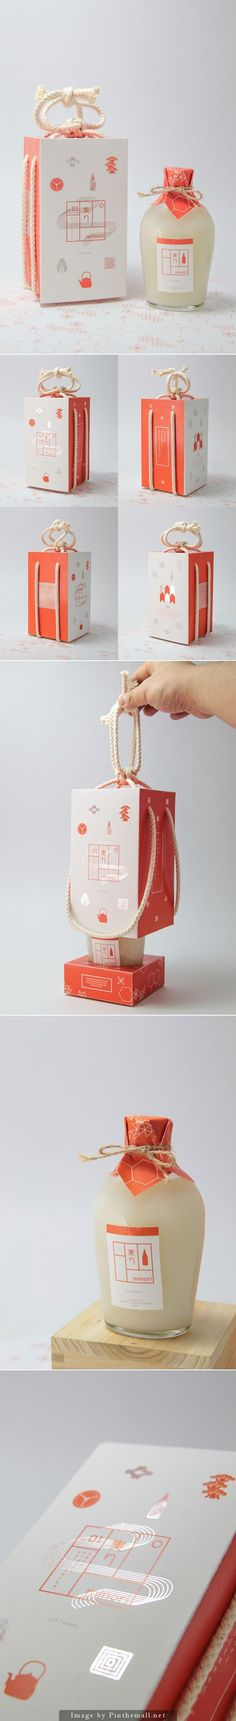 The very beautiful Minori Sake packaging curated by Packaging Diva PD created via https://www.behance.net/gallery/17444375/Minori-Sake: